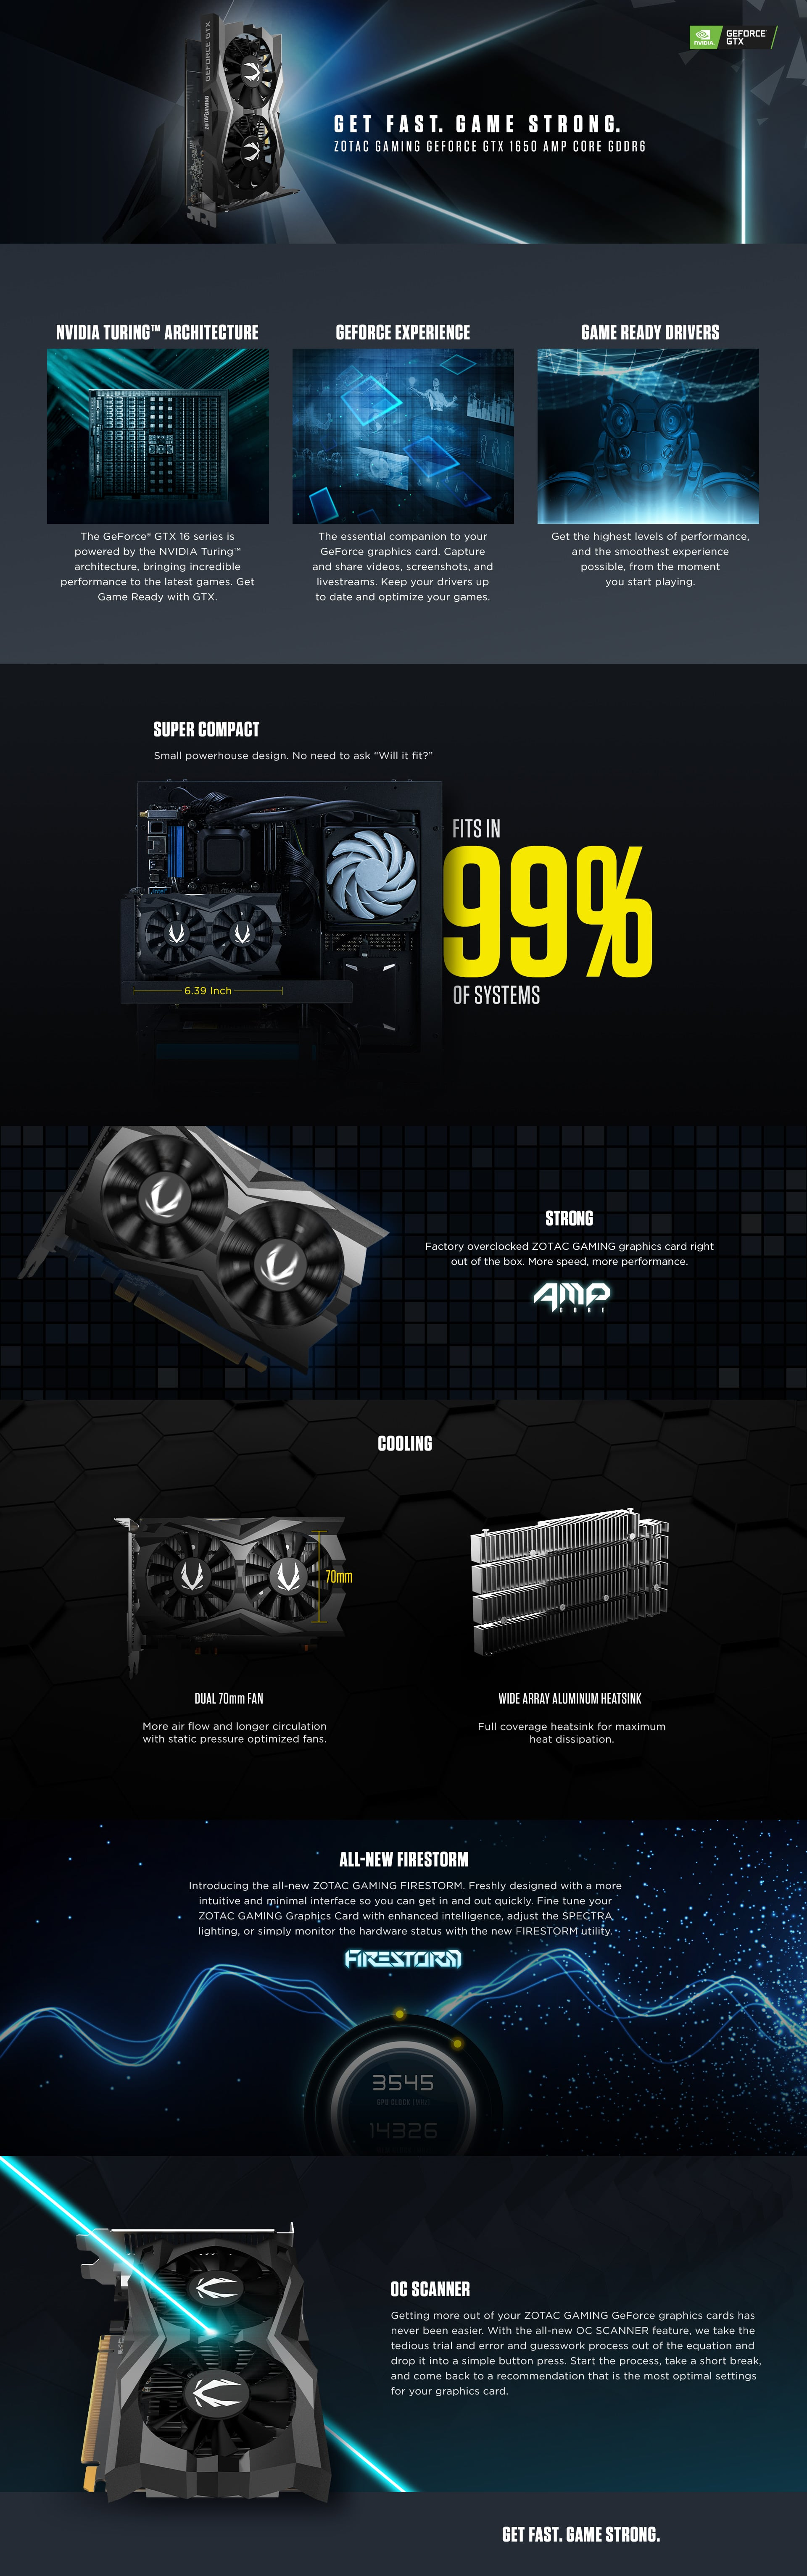 Tarjeta de video Zotac GeForce GTX 1650 AMP, 4GB, GDDR6, 128-Bit, HDMI